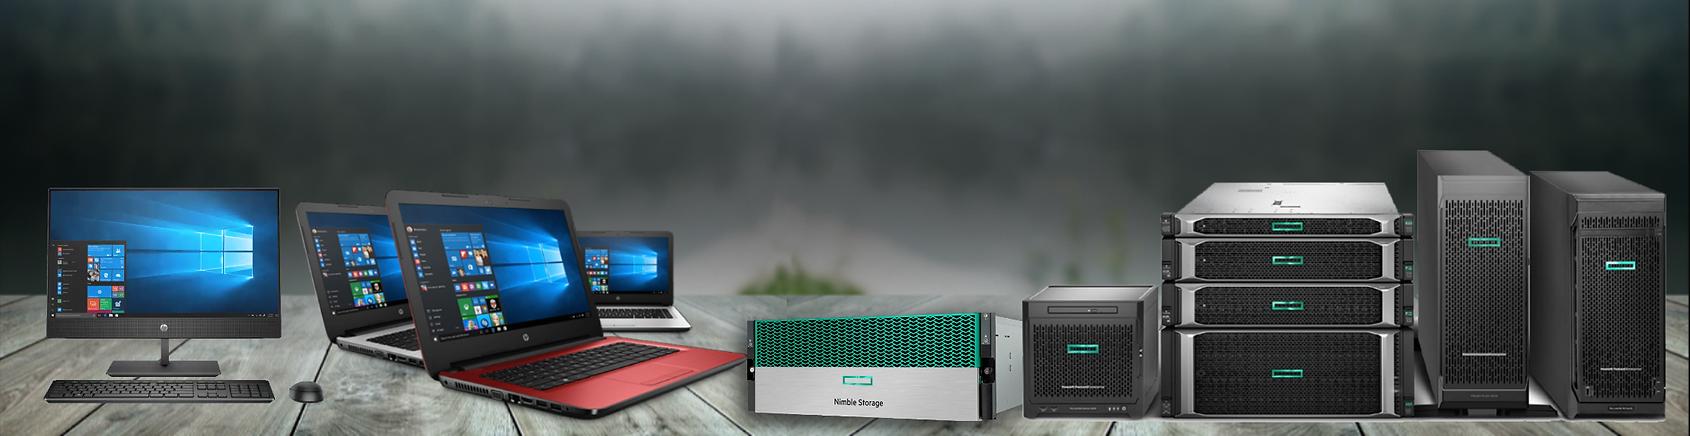 Touchline Technologies Pvt Ltd Rental Solutions For desktops, Laptops, Server , Storage